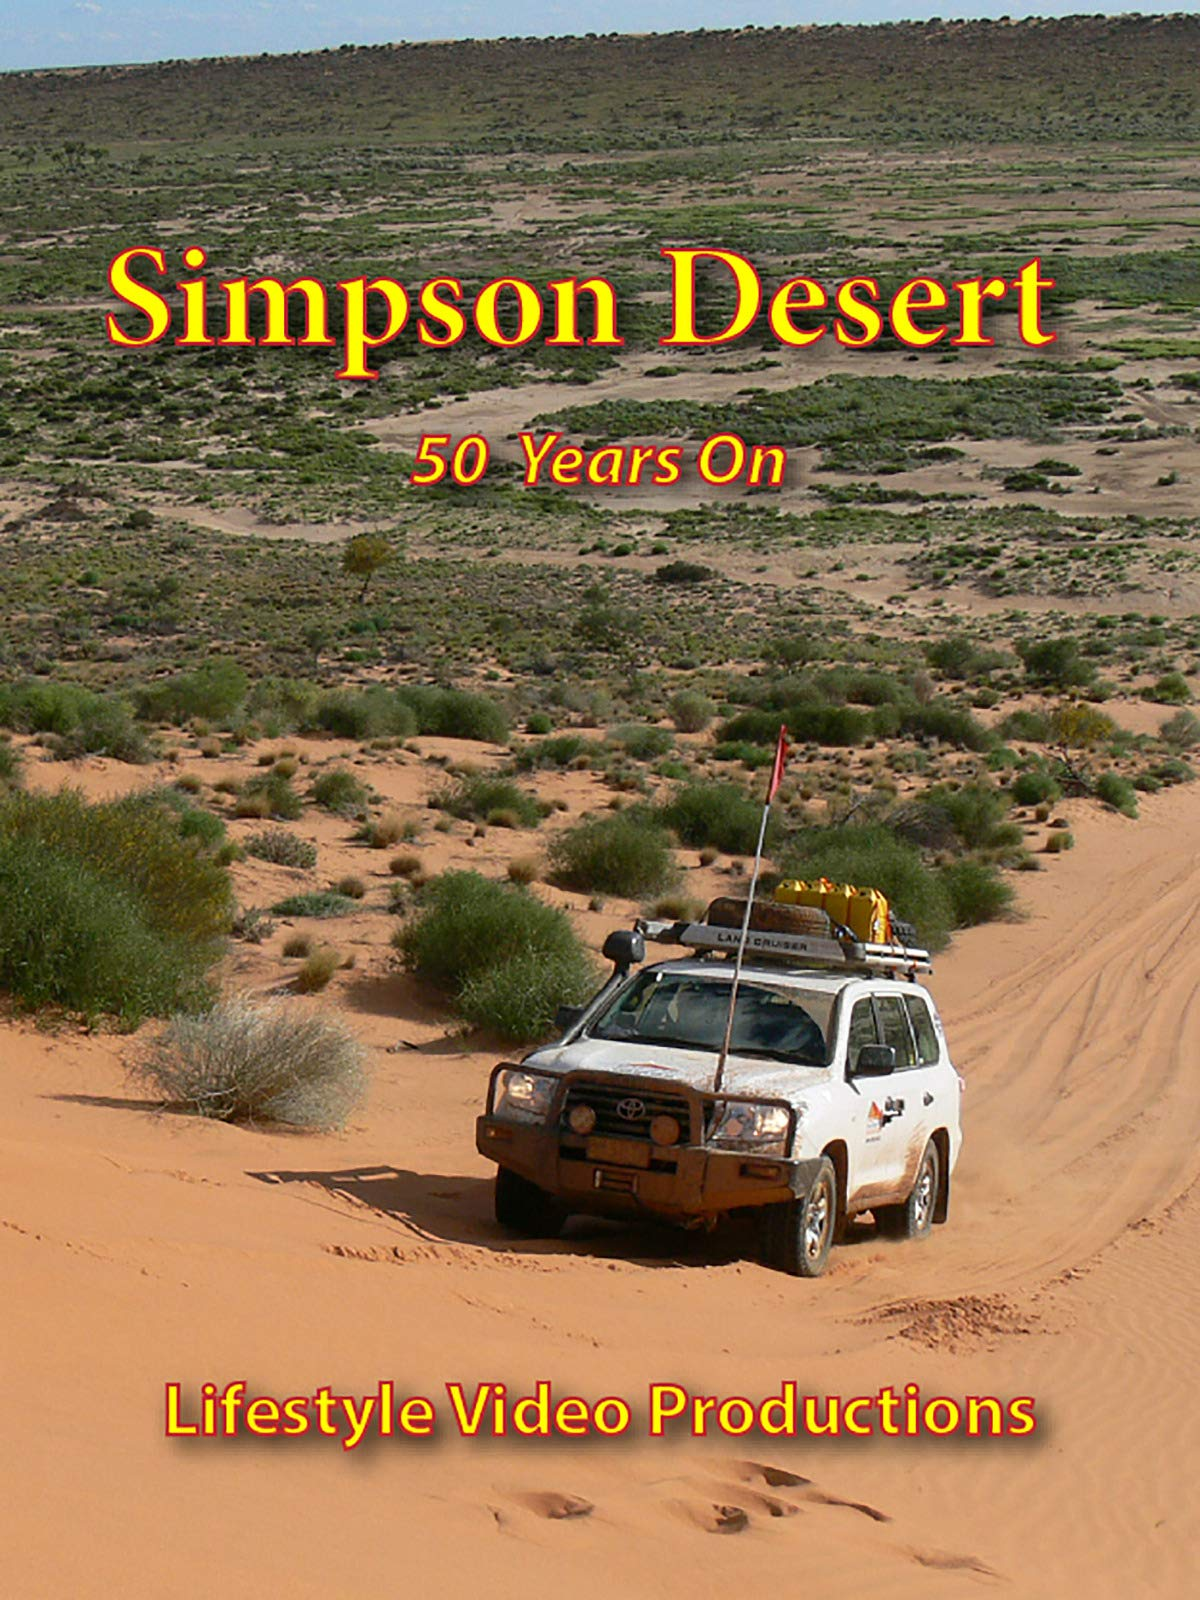 Simpson Desert: 50 Years On on Amazon Prime Instant Video UK